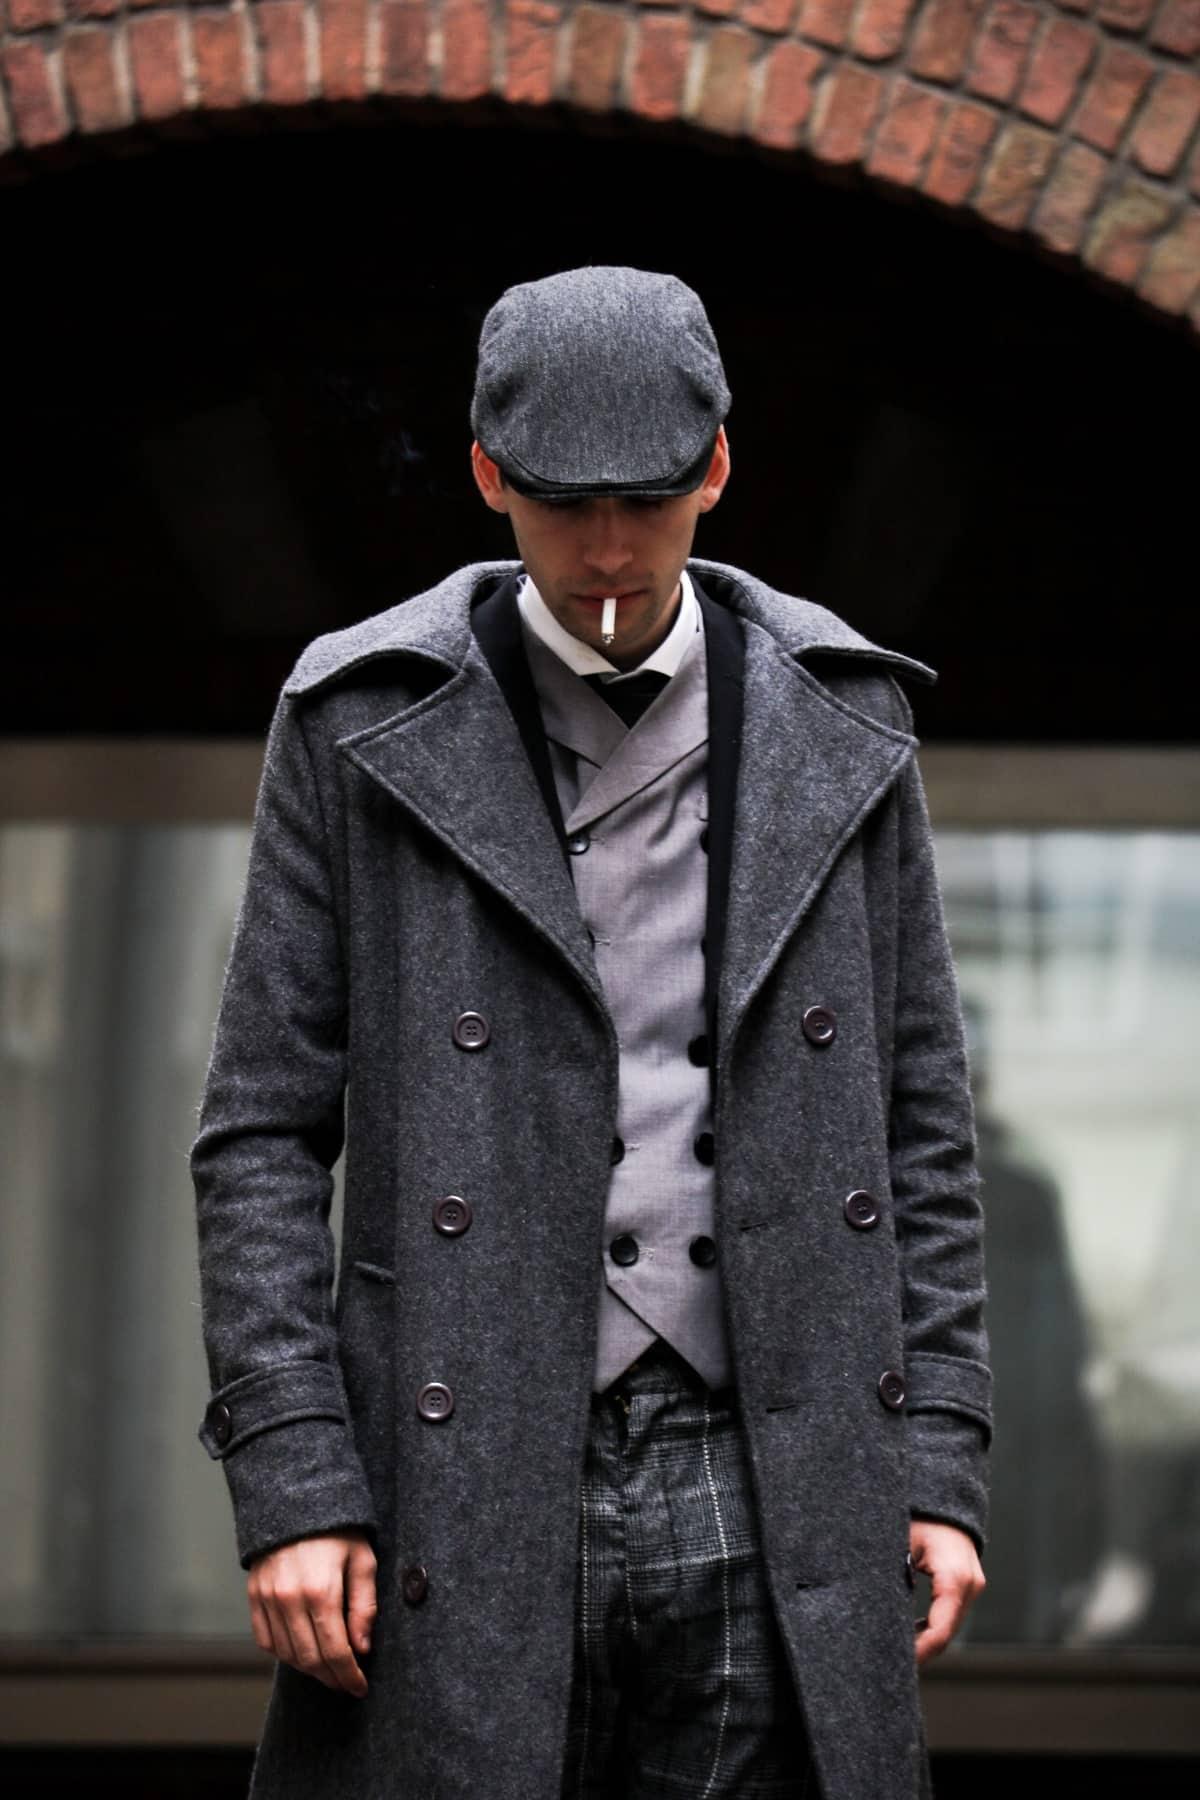 20210925193202clothing-coat-overcoat-fashion-outerwear-street-fashion-1519063-pxhere.com.jpg